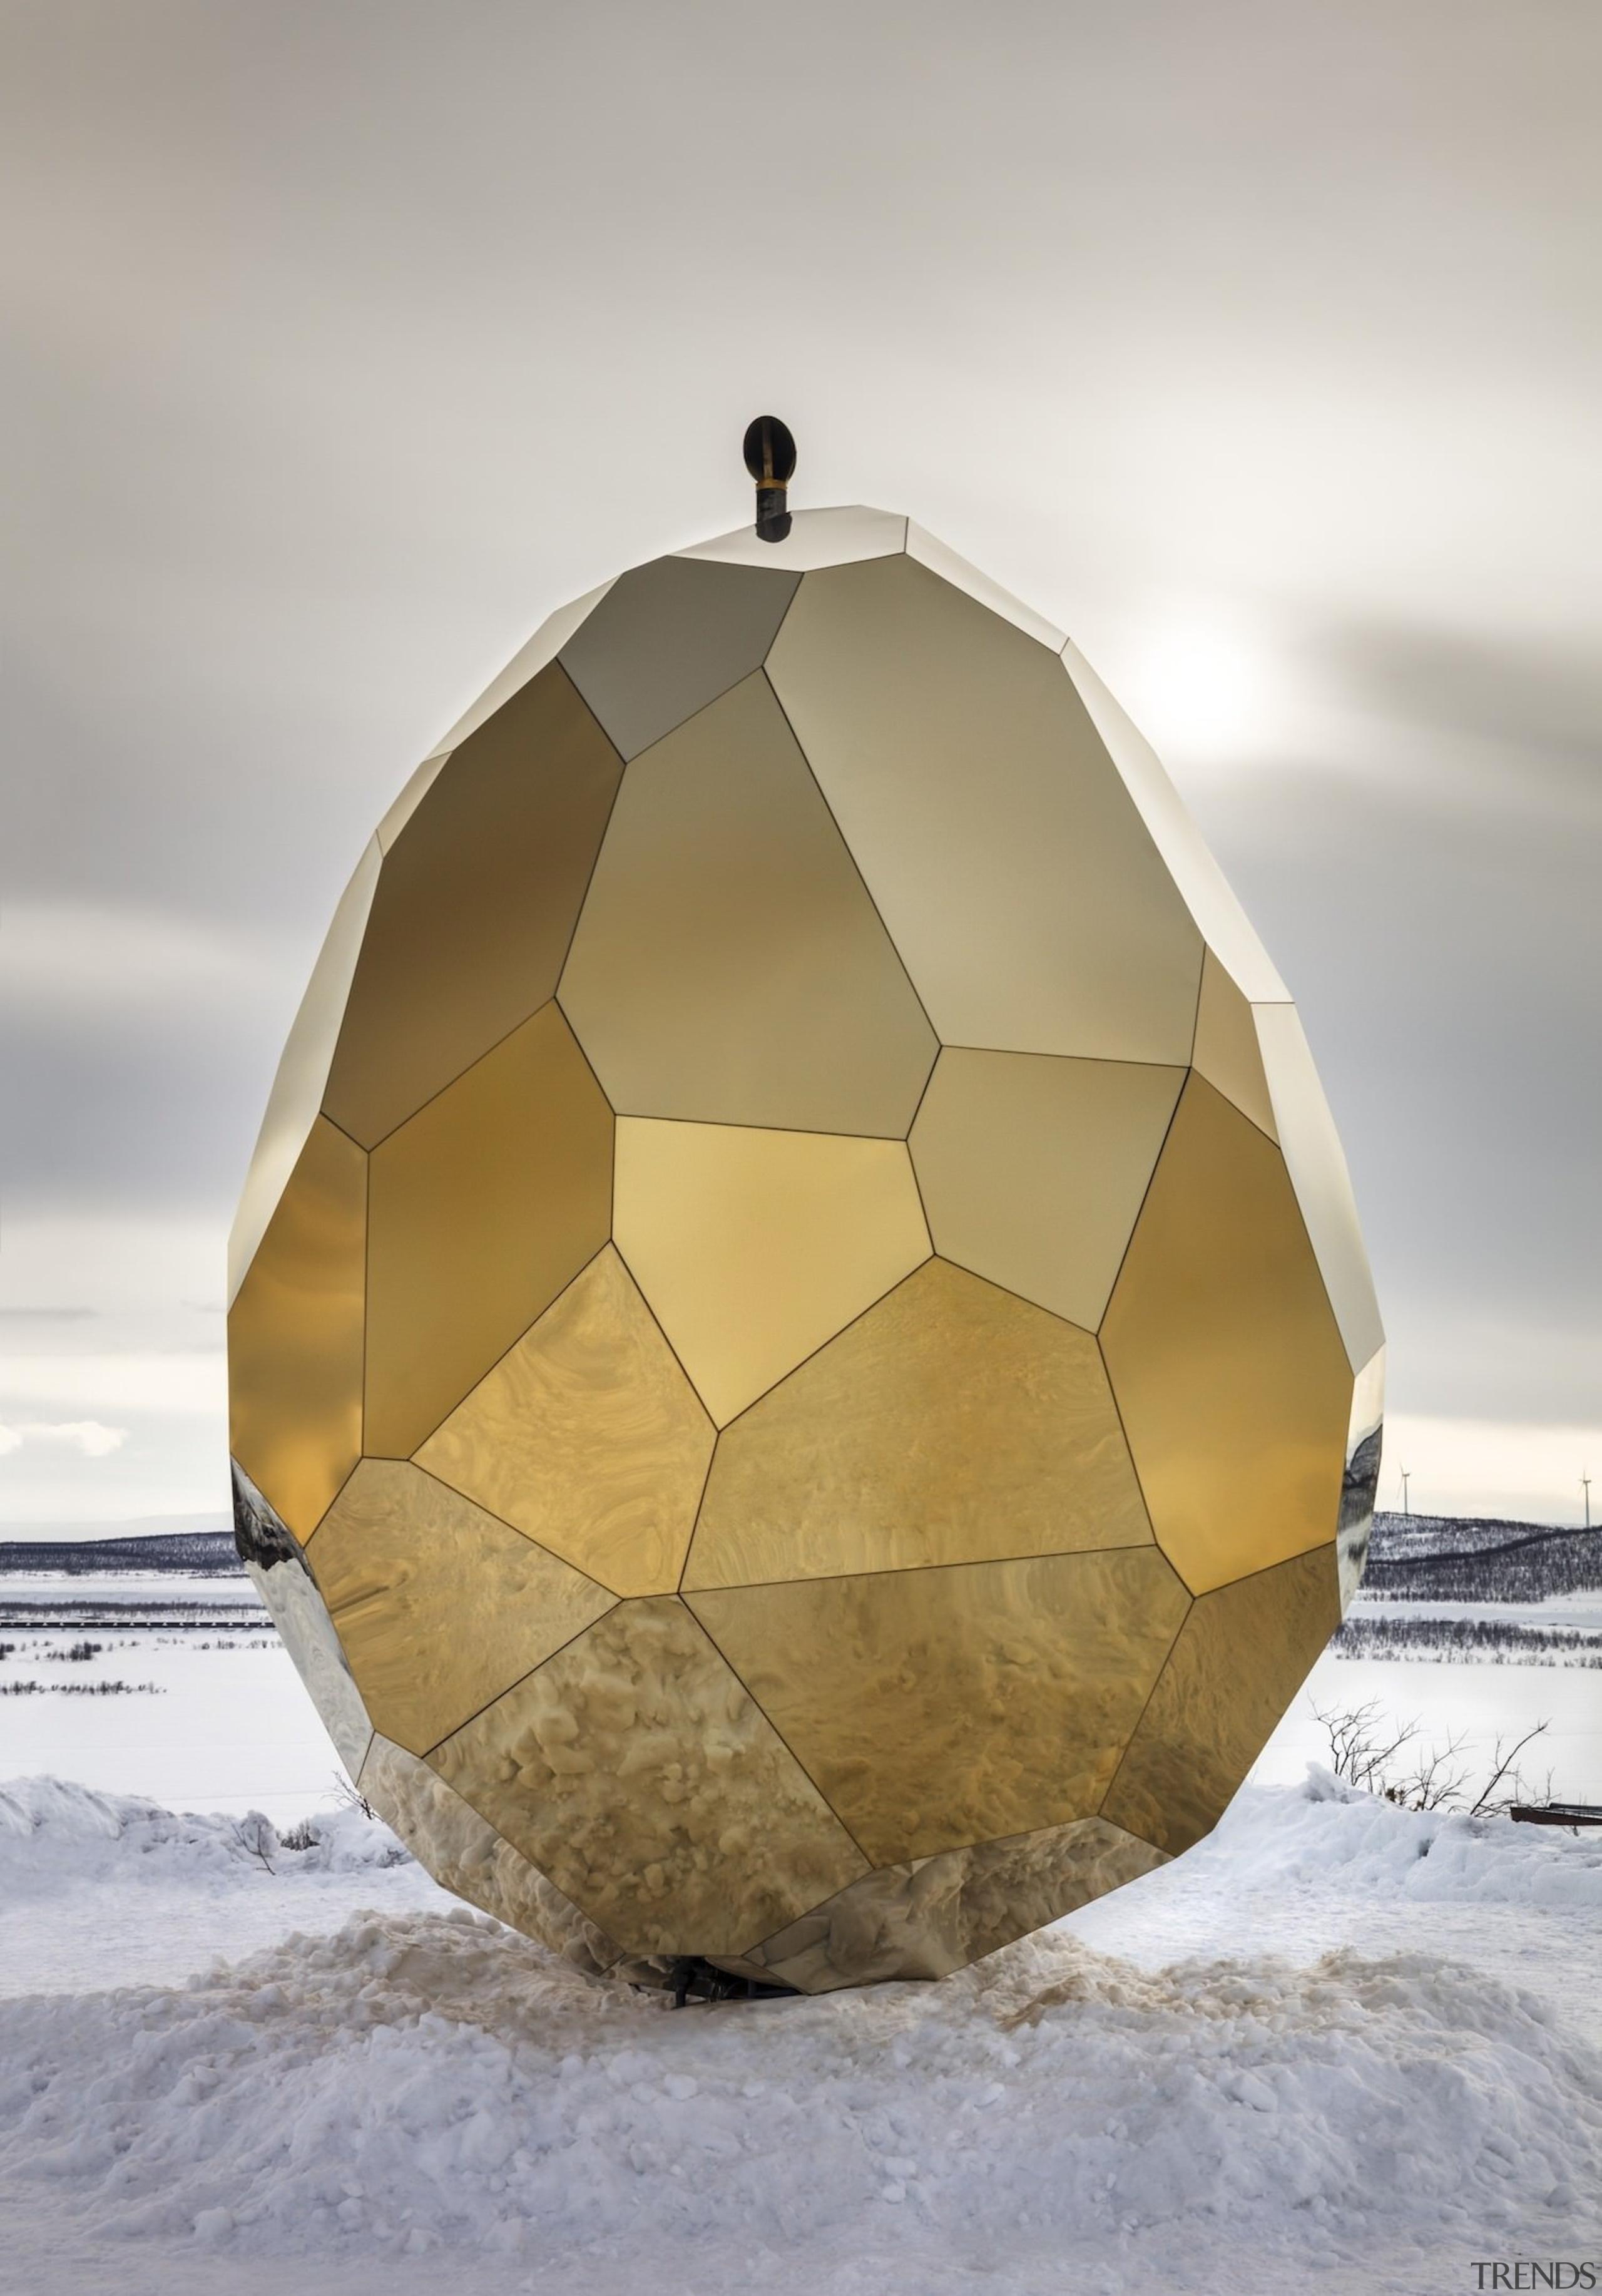 Designed by Bigert & BergströmPhotography by Jean-Baptiste sphere, gray